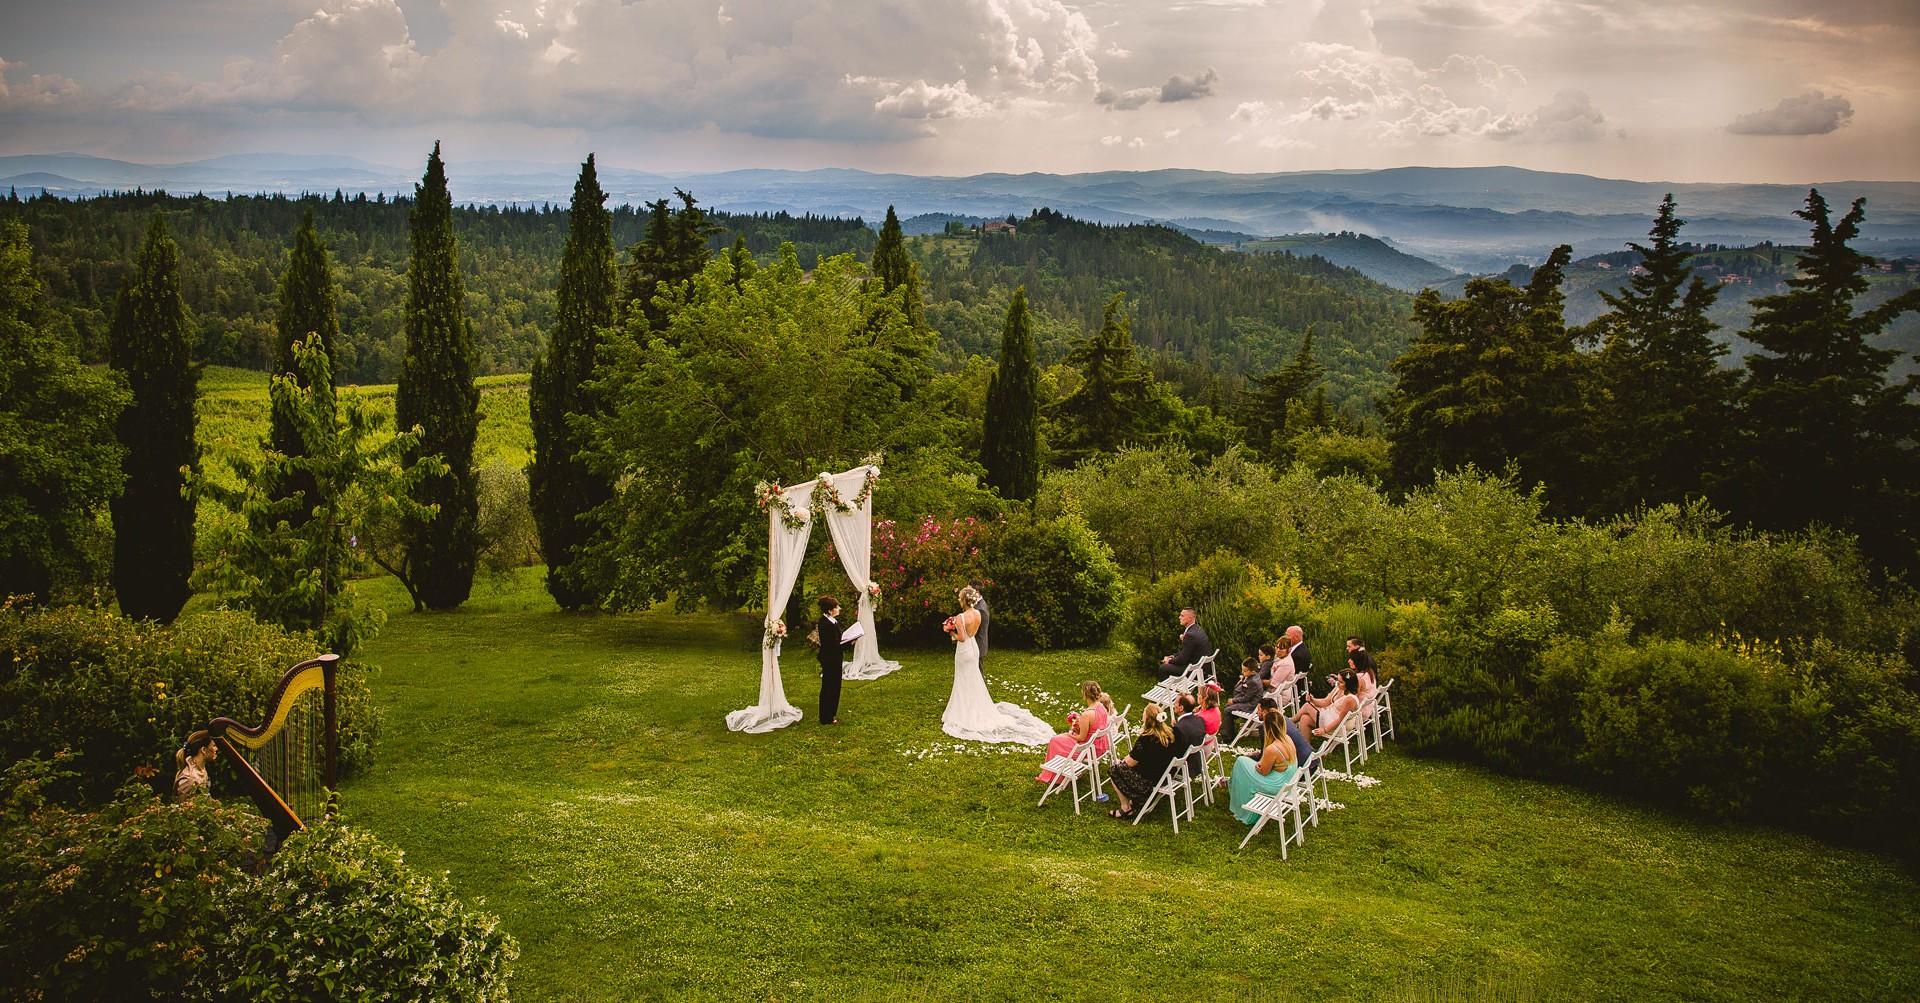 Miglior-Destination-Wedding-Photographer-Italia